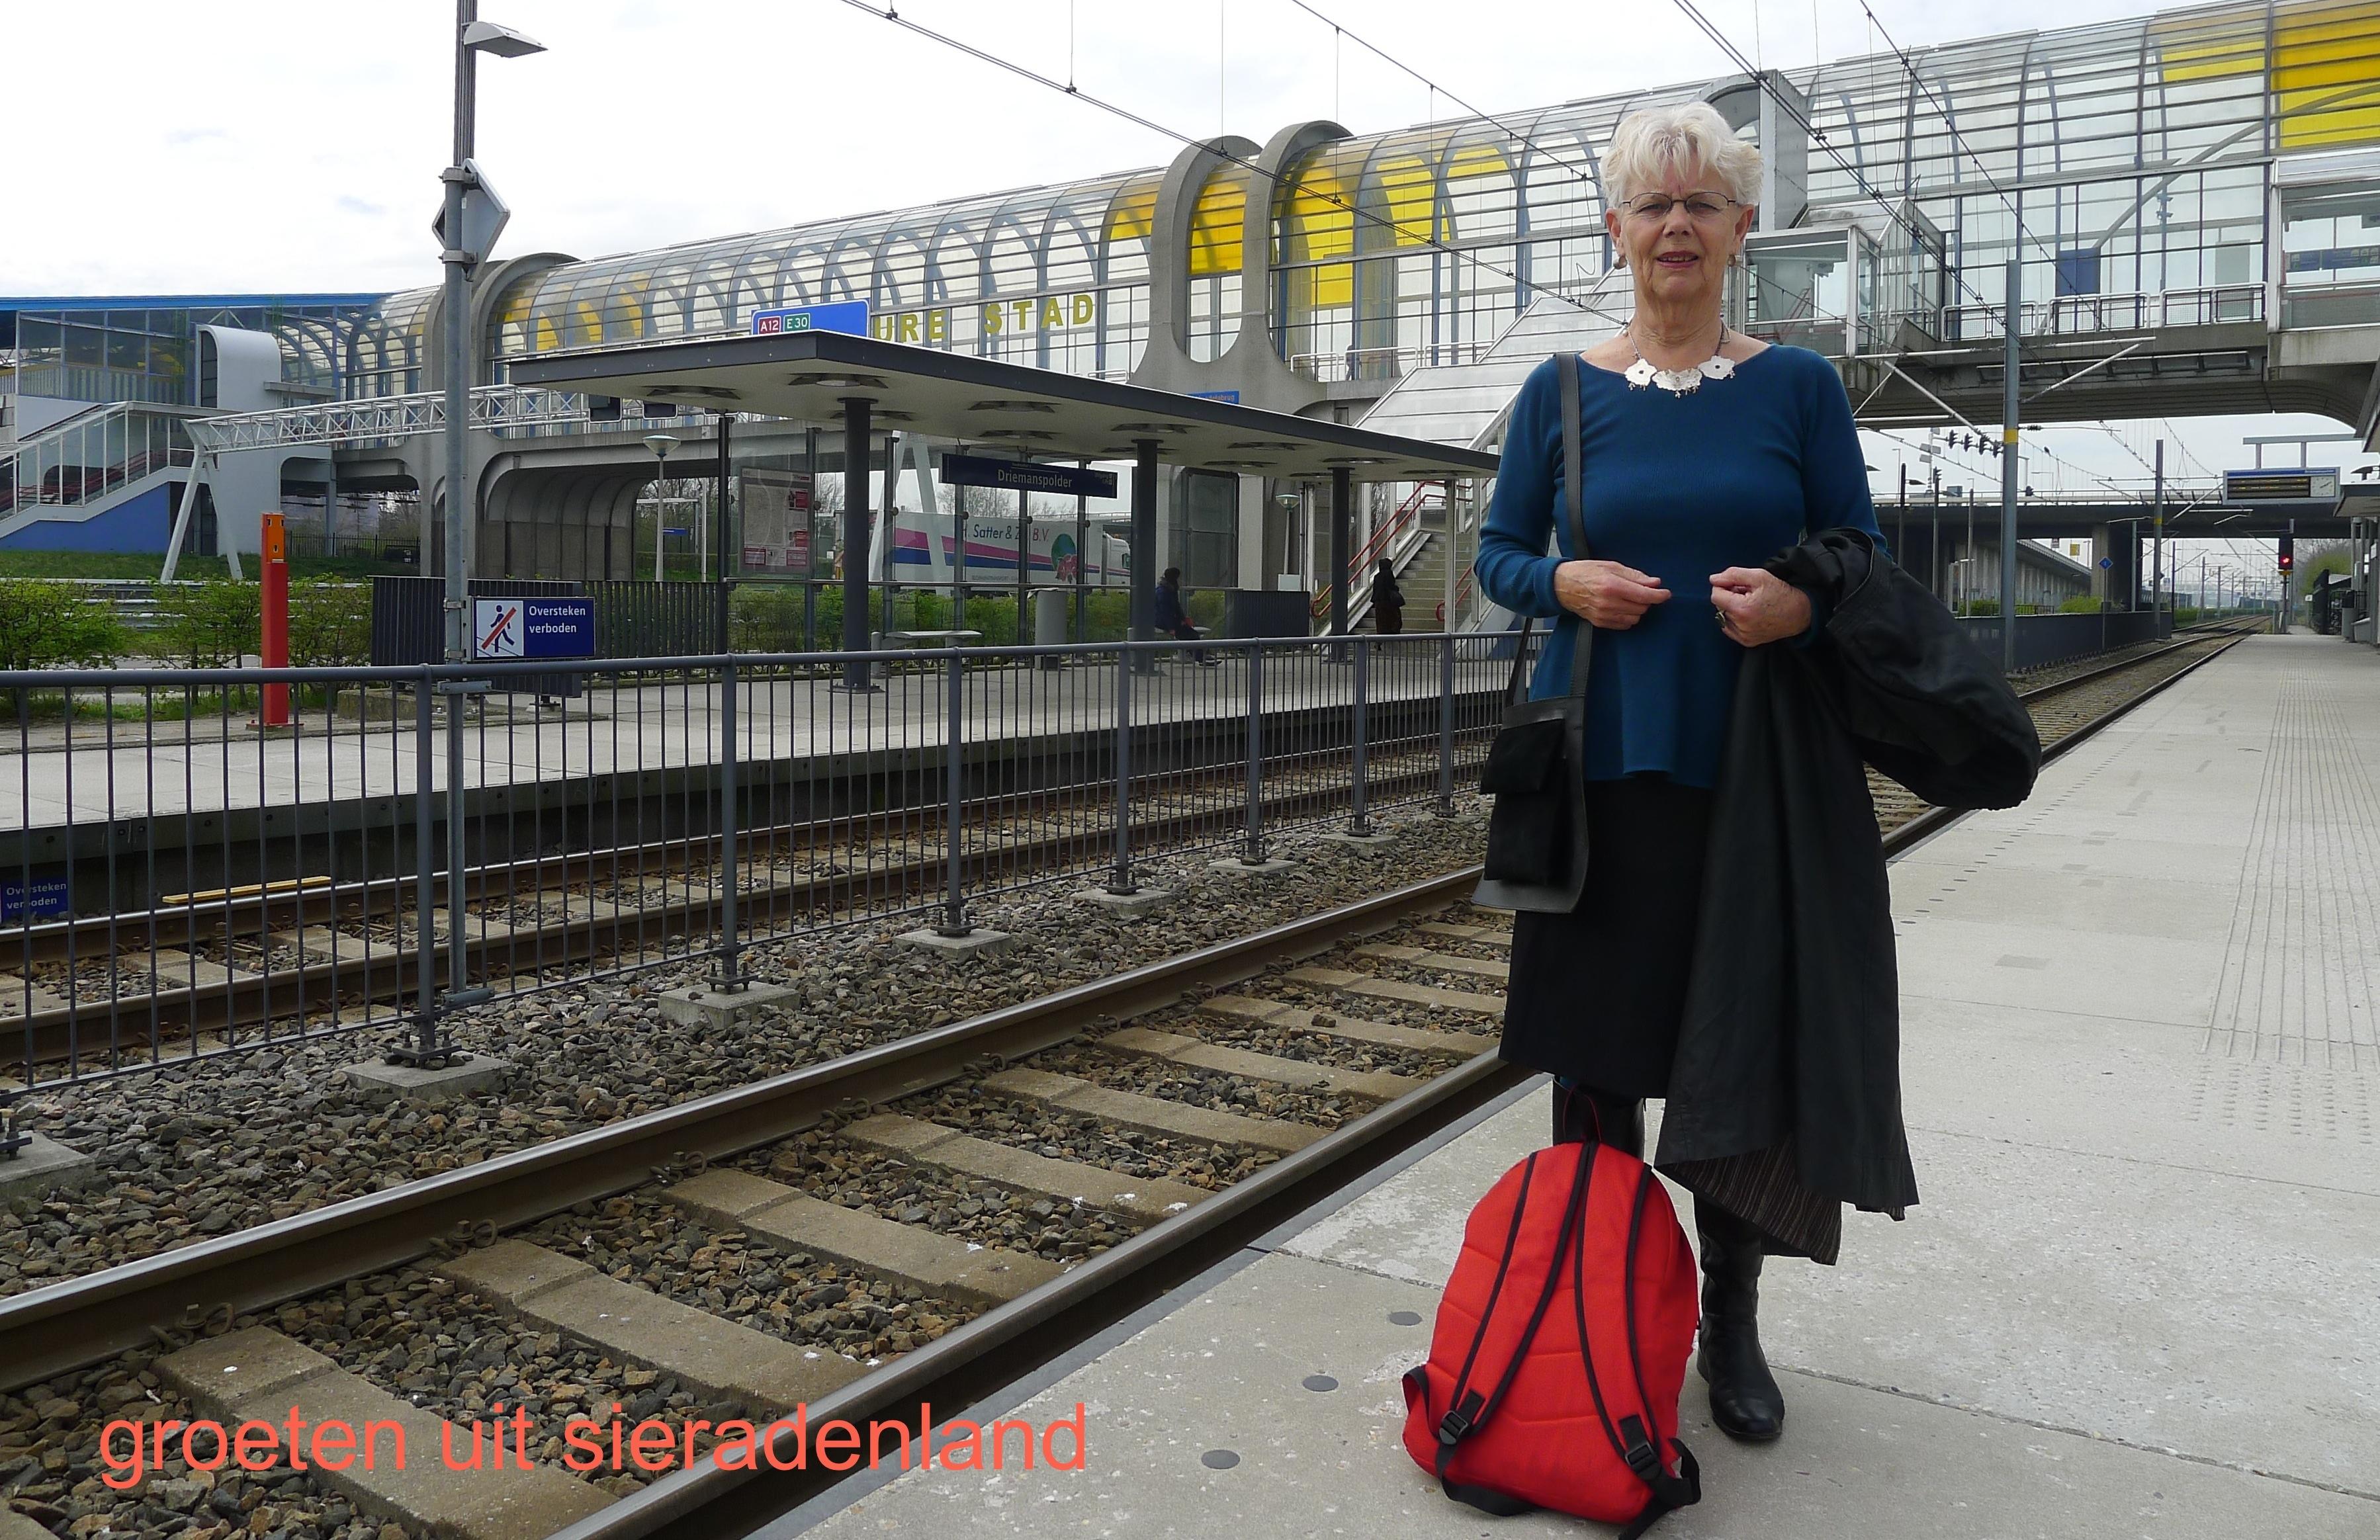 Claartje Keur, Zelfportret met halssieraad van Liesbeth Rommers, Zoetermeer, Station Driemanspolder, 25 april 2013. Foto Claartje Keur